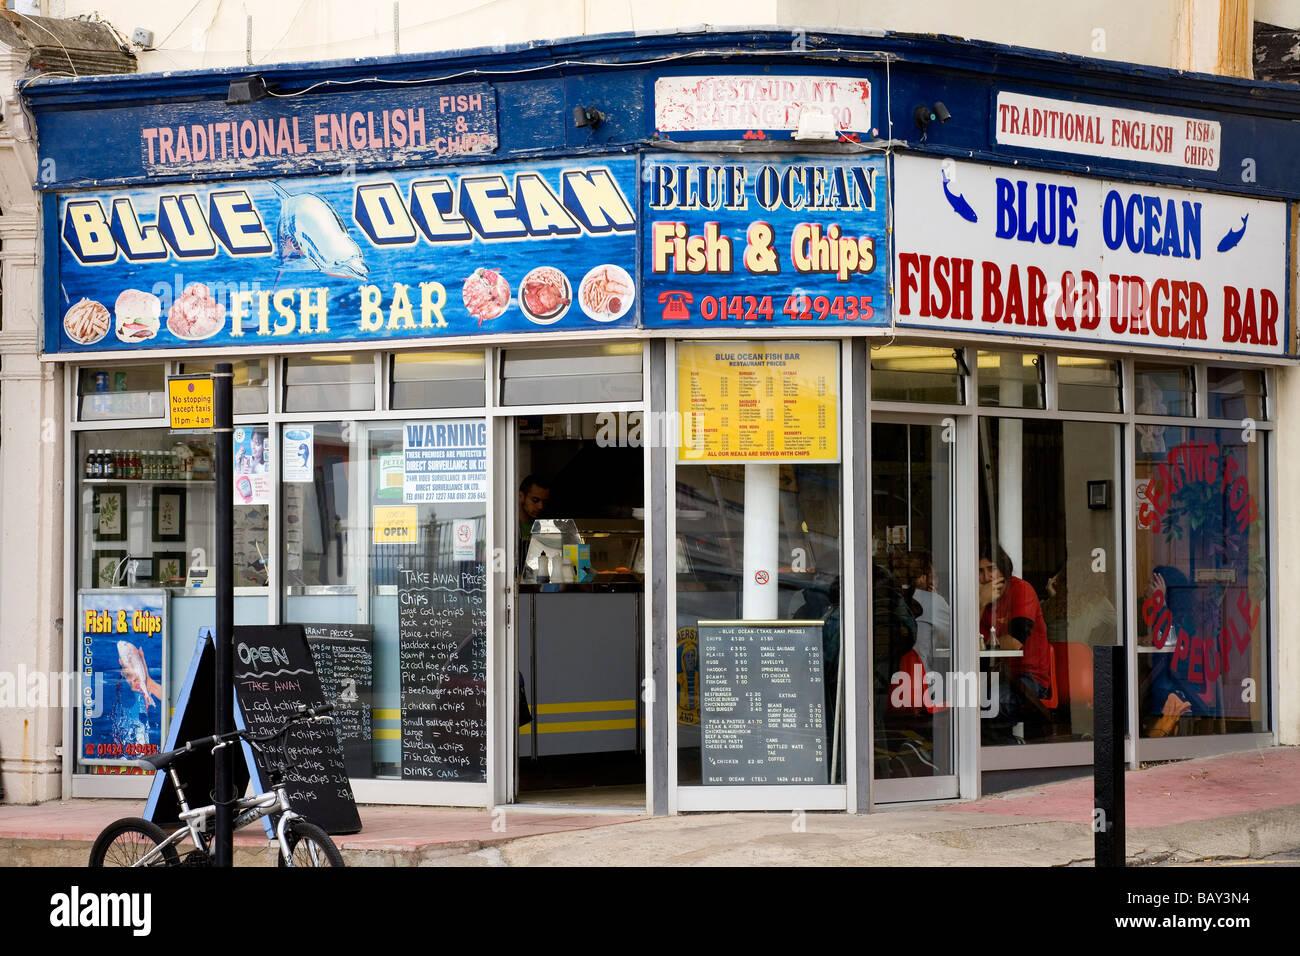 Fish Shop Q Centre